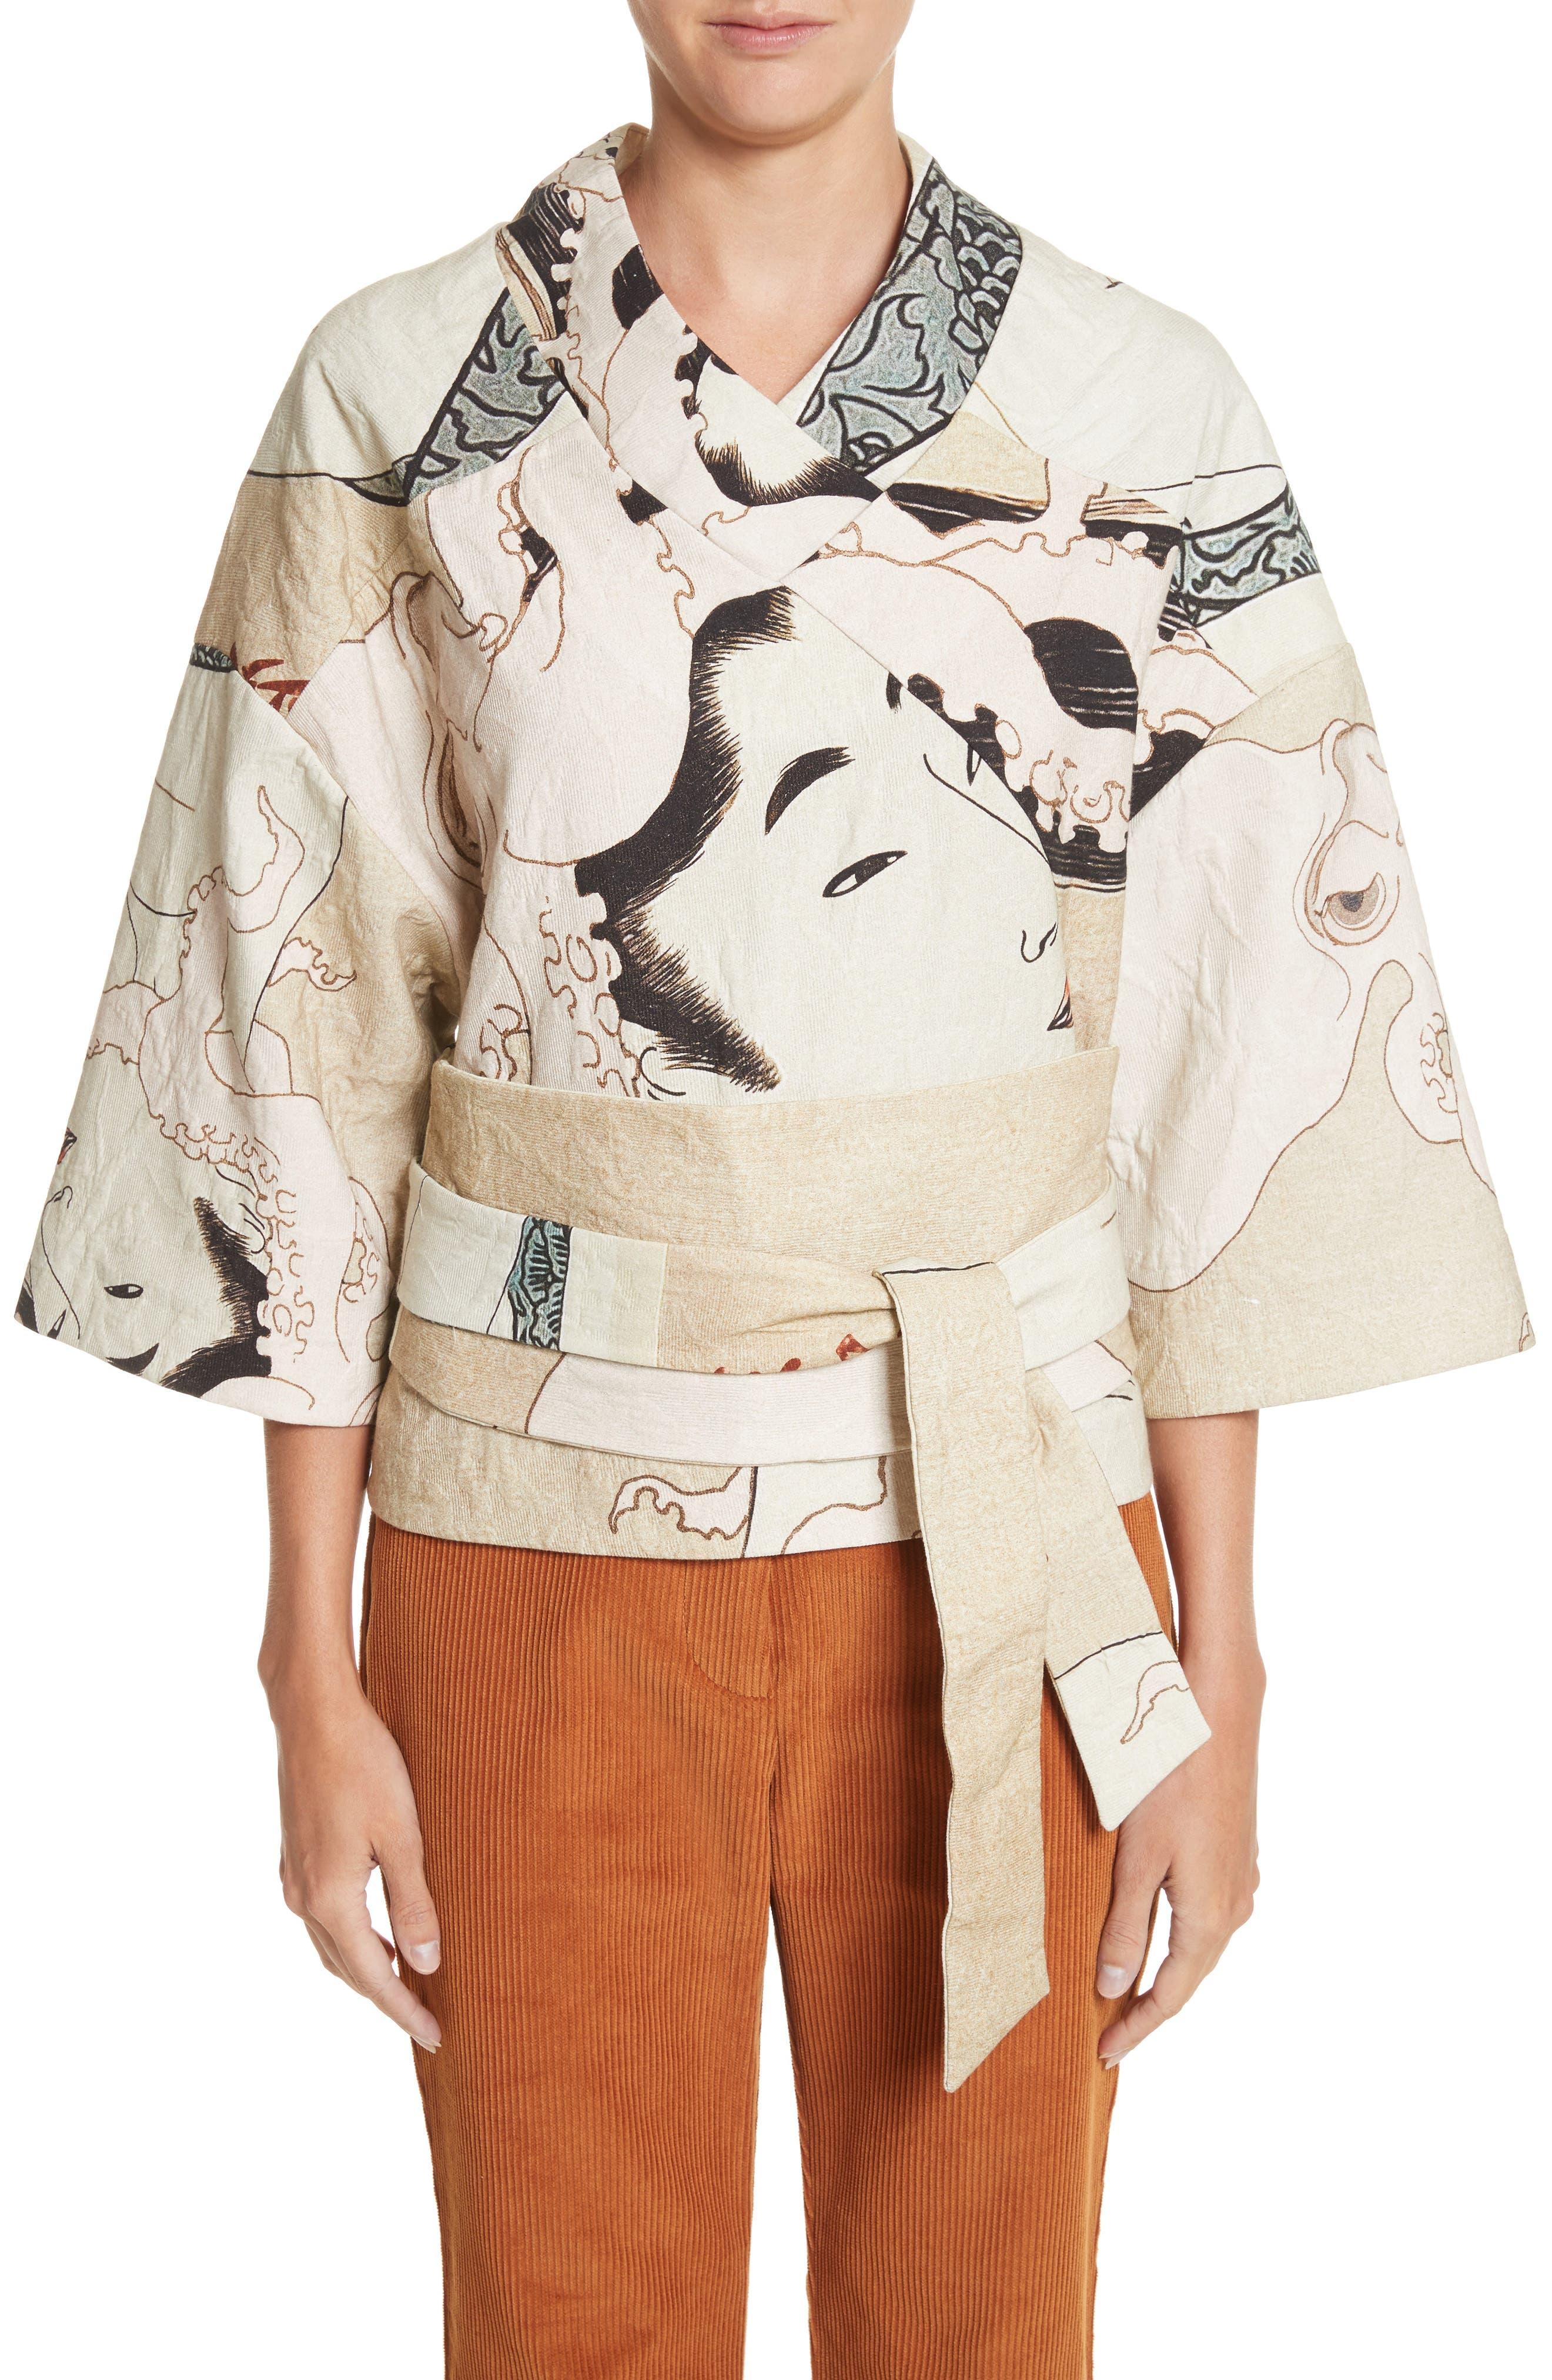 Alternate Image 1 Selected - A.W.A.K.E. Printed Kimono Bomber Jacket